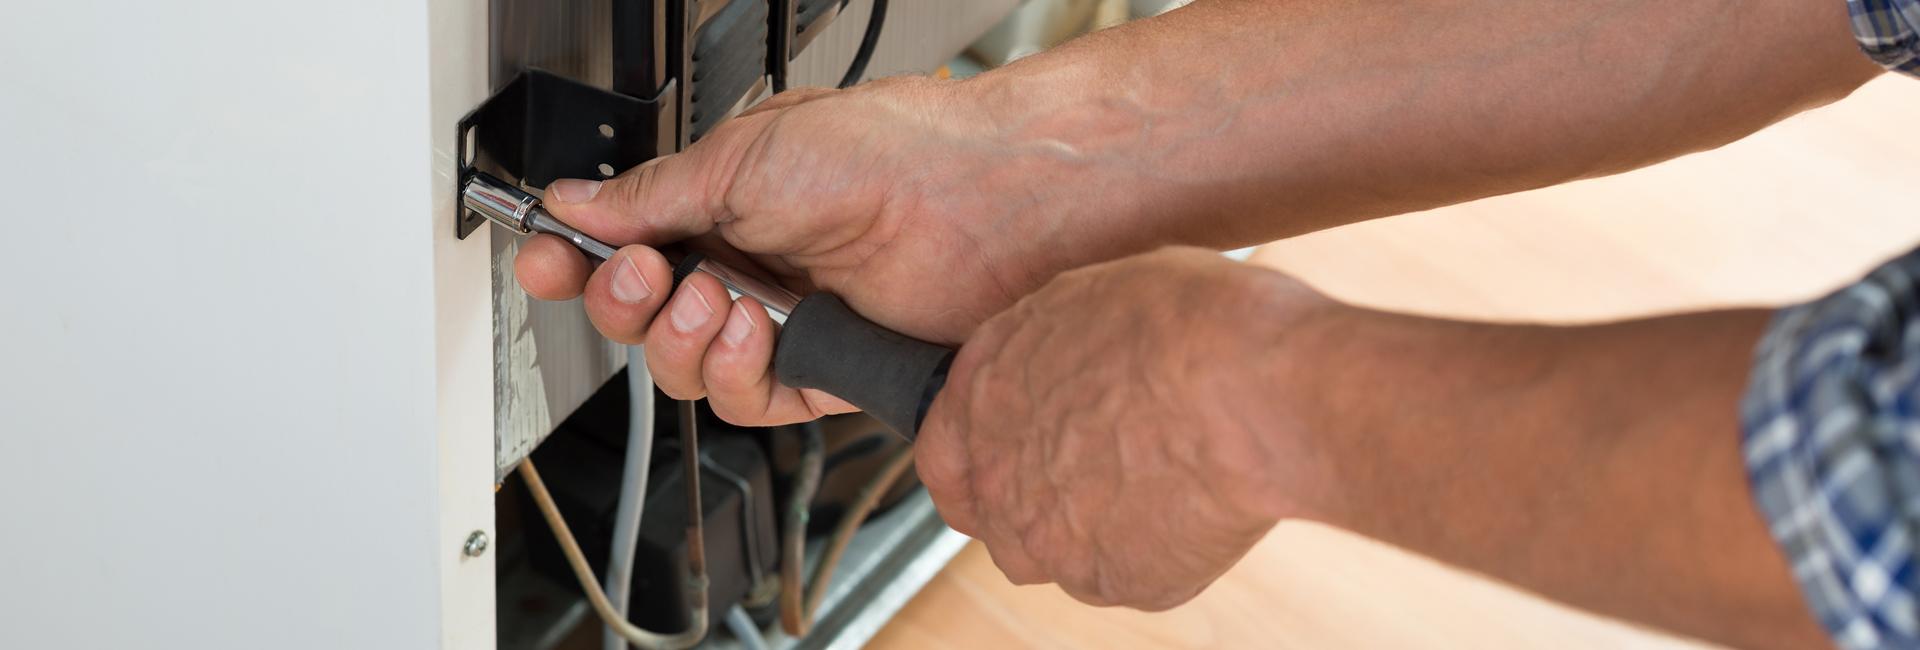 reparateur frigo topelectro fribourg. Black Bedroom Furniture Sets. Home Design Ideas